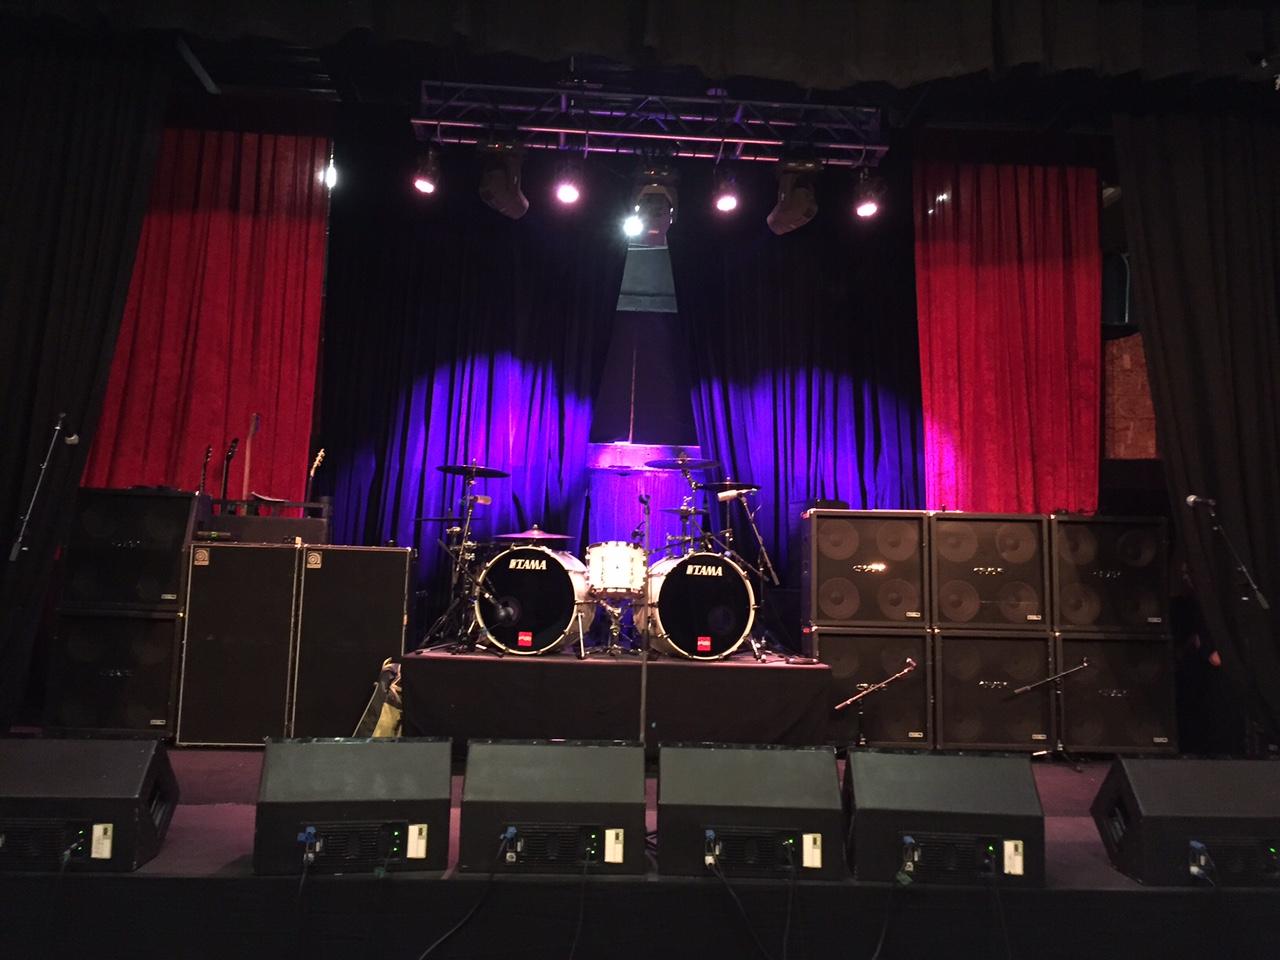 Image of the stage inside the showroom of Royal Wedding Chapel Las Vegas Nevada. Photo taken from website  royalweddingchapel.com